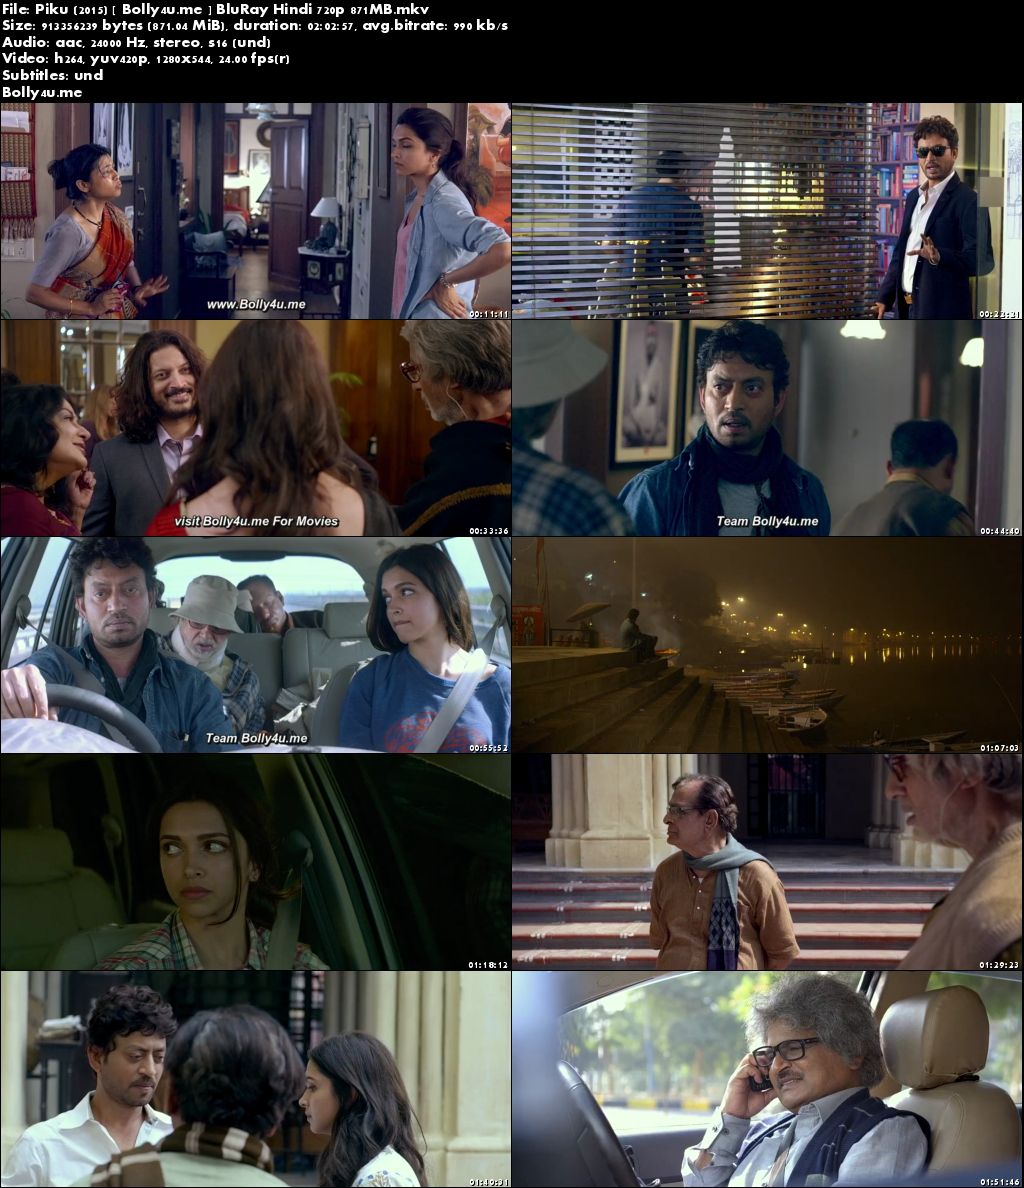 Piku 2015 BluRay 850Mb Full Hindi Movie Download 720p